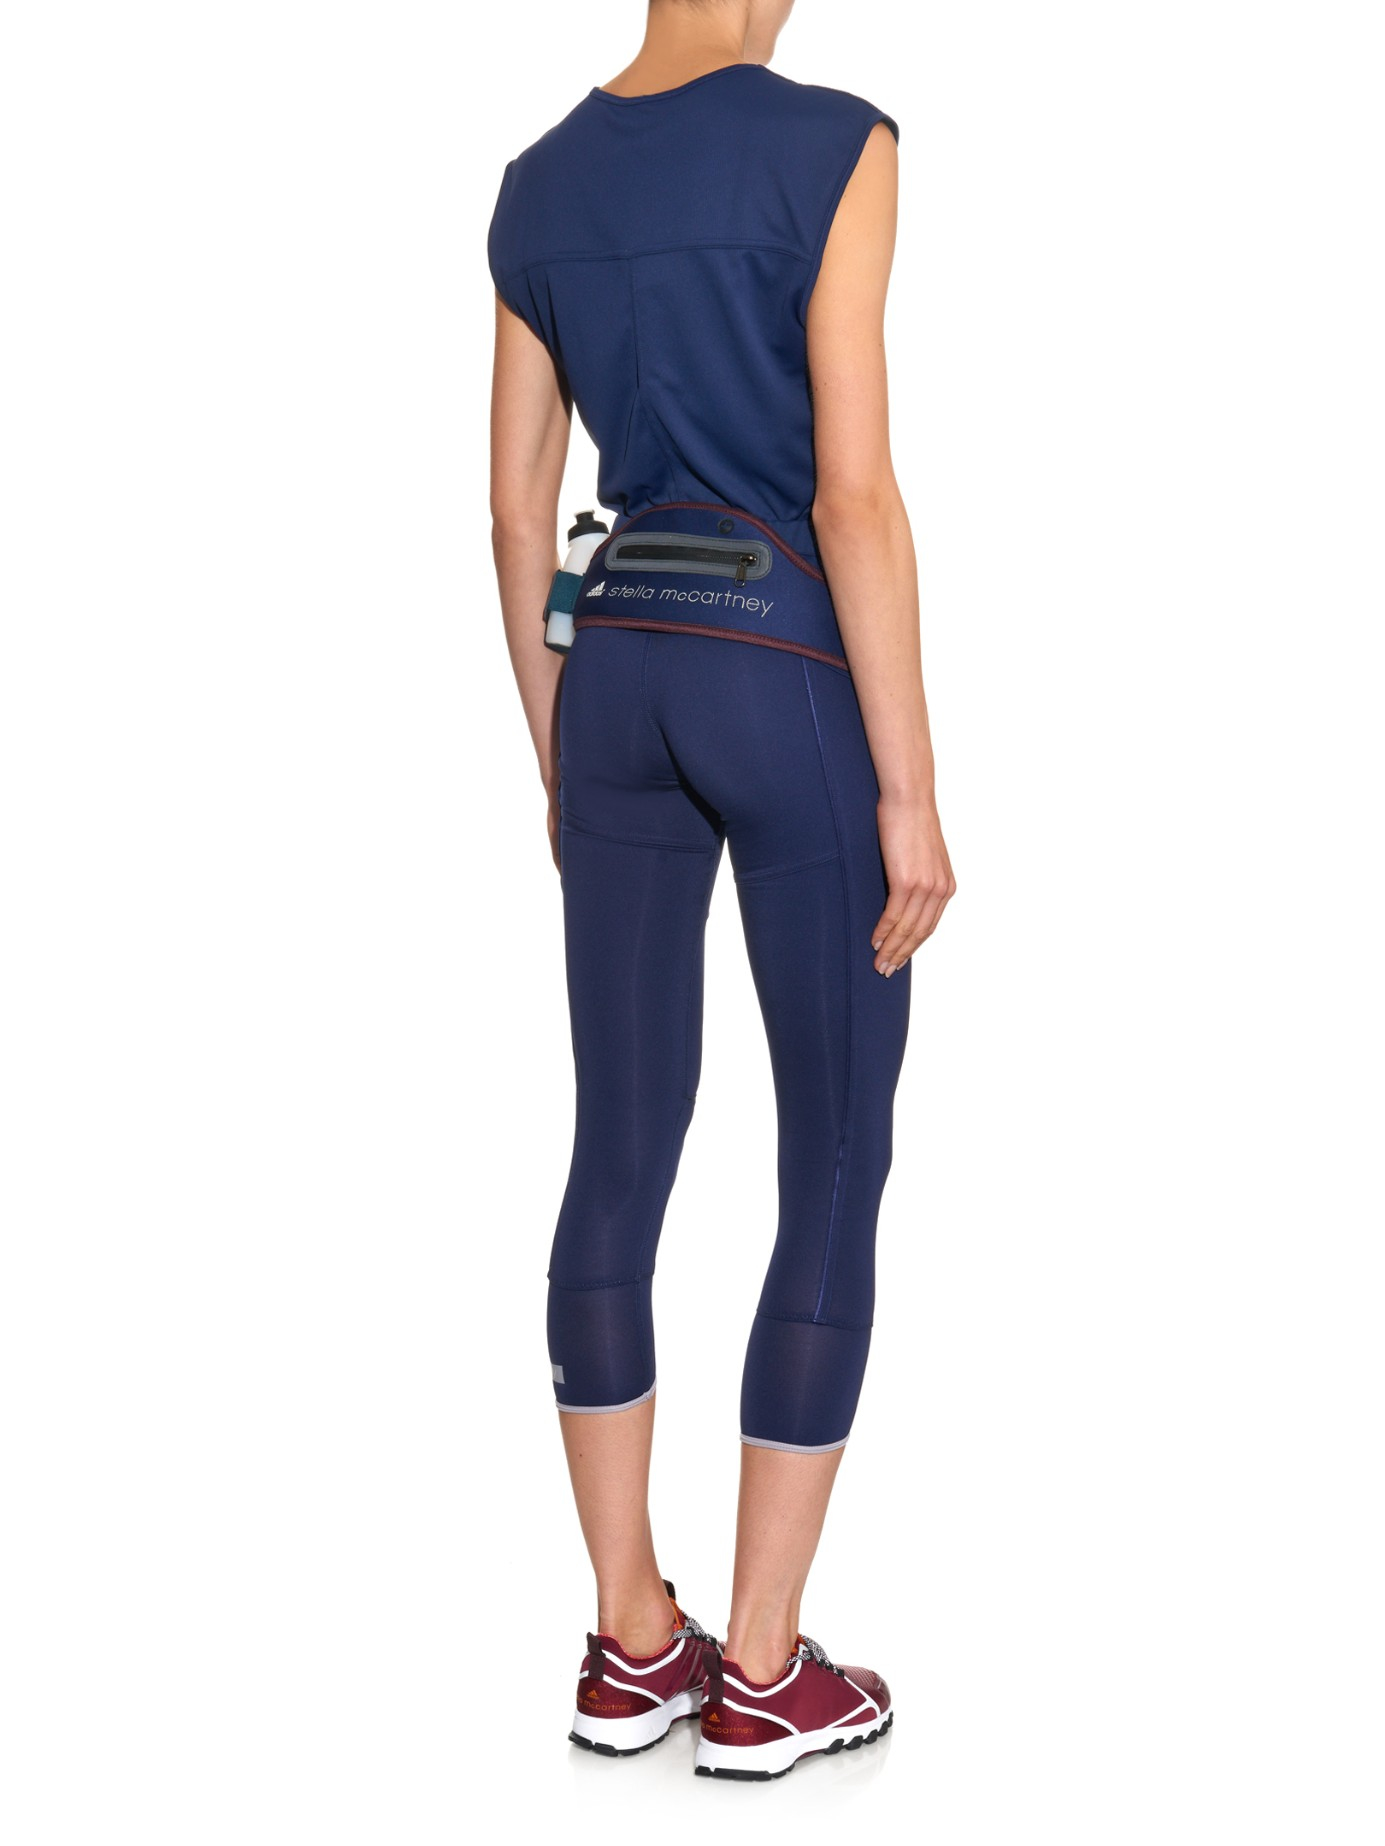 lyst adidas by stella mccartney running belt in blue. Black Bedroom Furniture Sets. Home Design Ideas